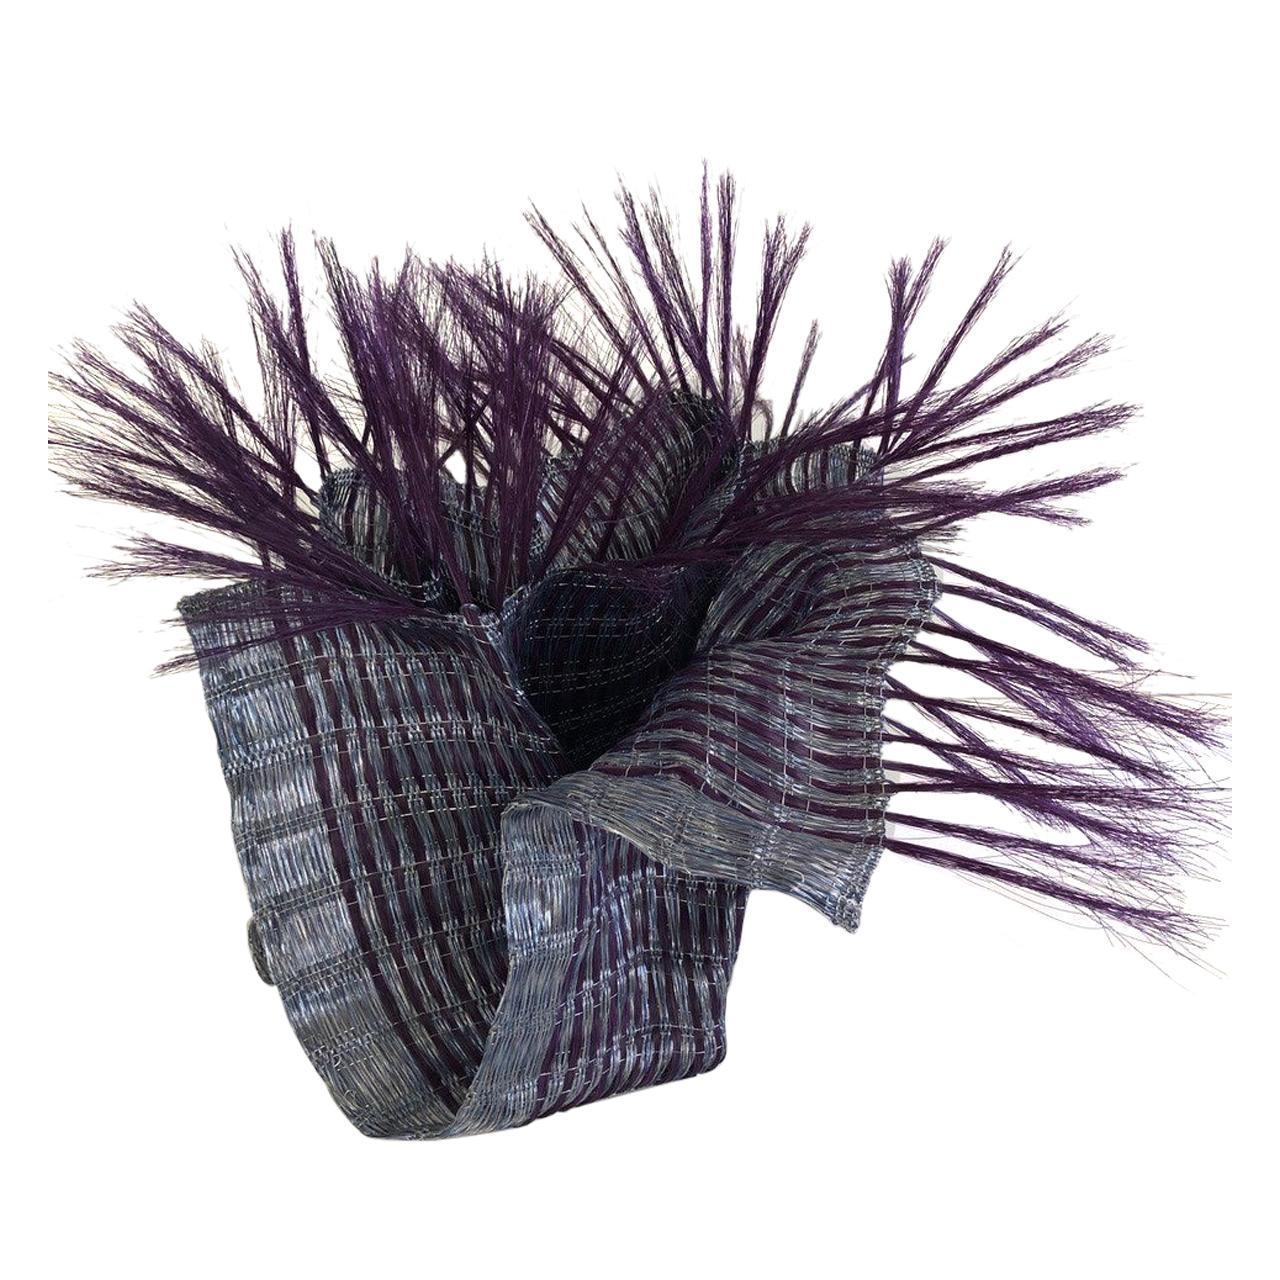 Textile Sculpture by Annemette Beck Lacquered Copper Danish Contemporary